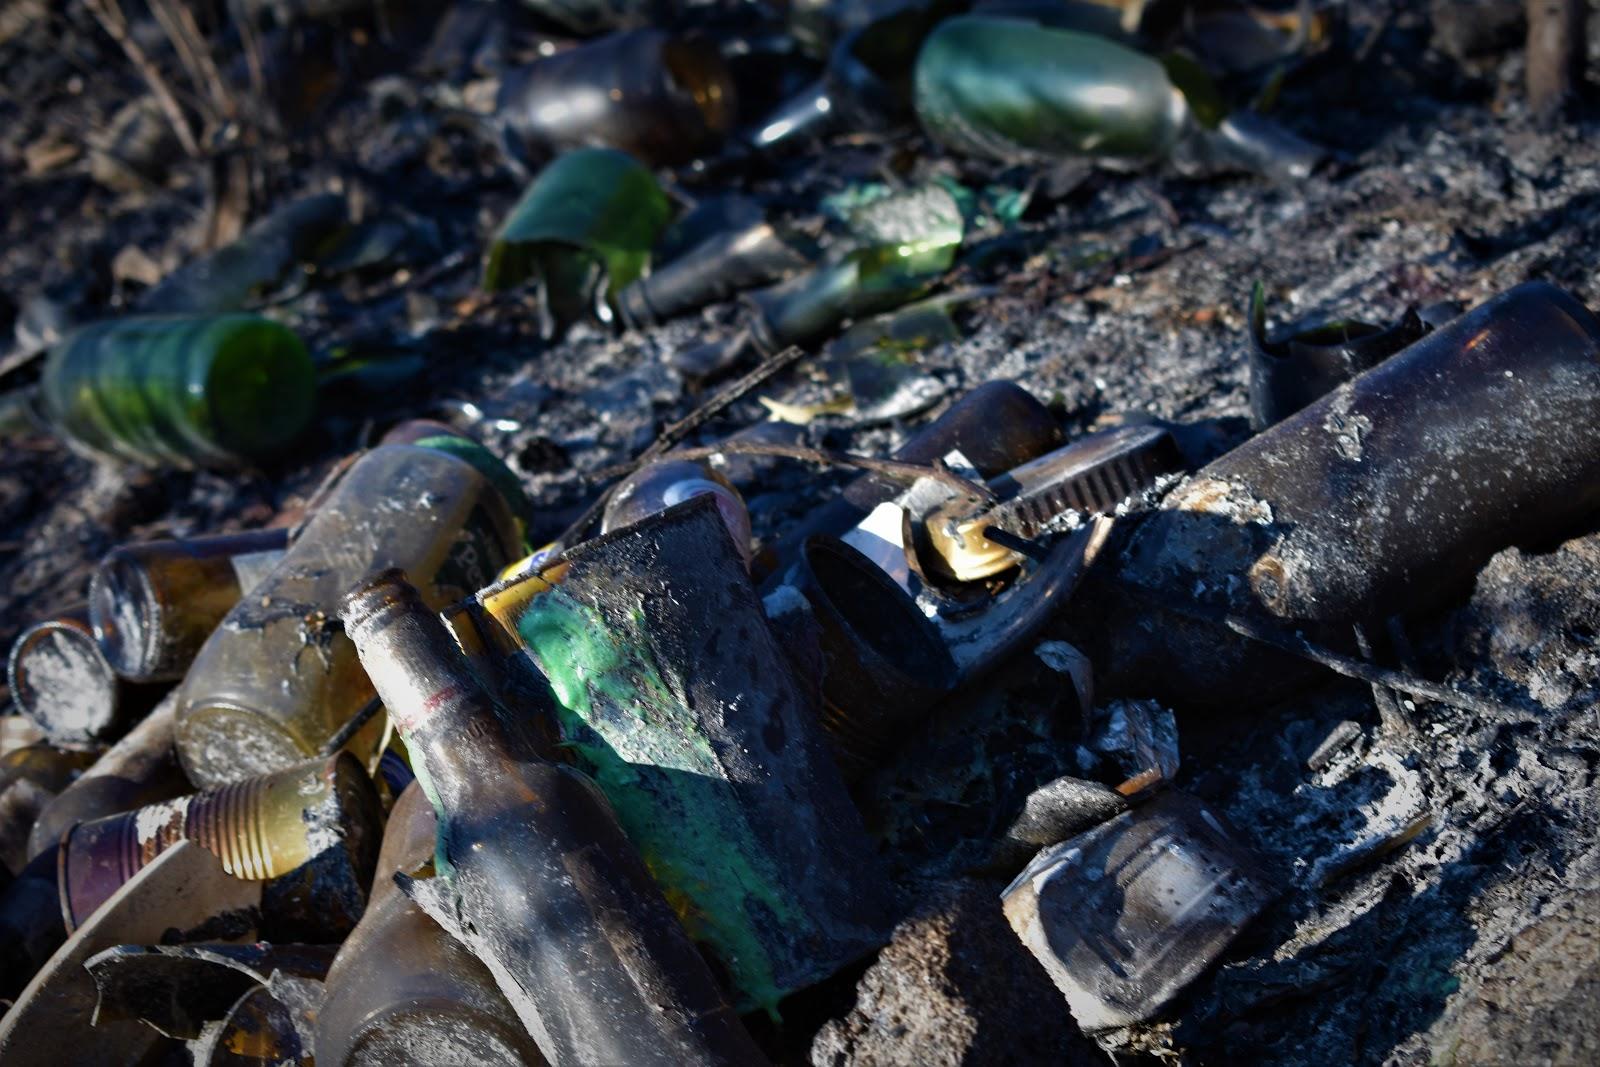 Plástico, vidros, metais... depositados no solo, anteriormente e posteriormente ao incêndio, deixando uma grande incógnita sobre a toxicidade dos solos.